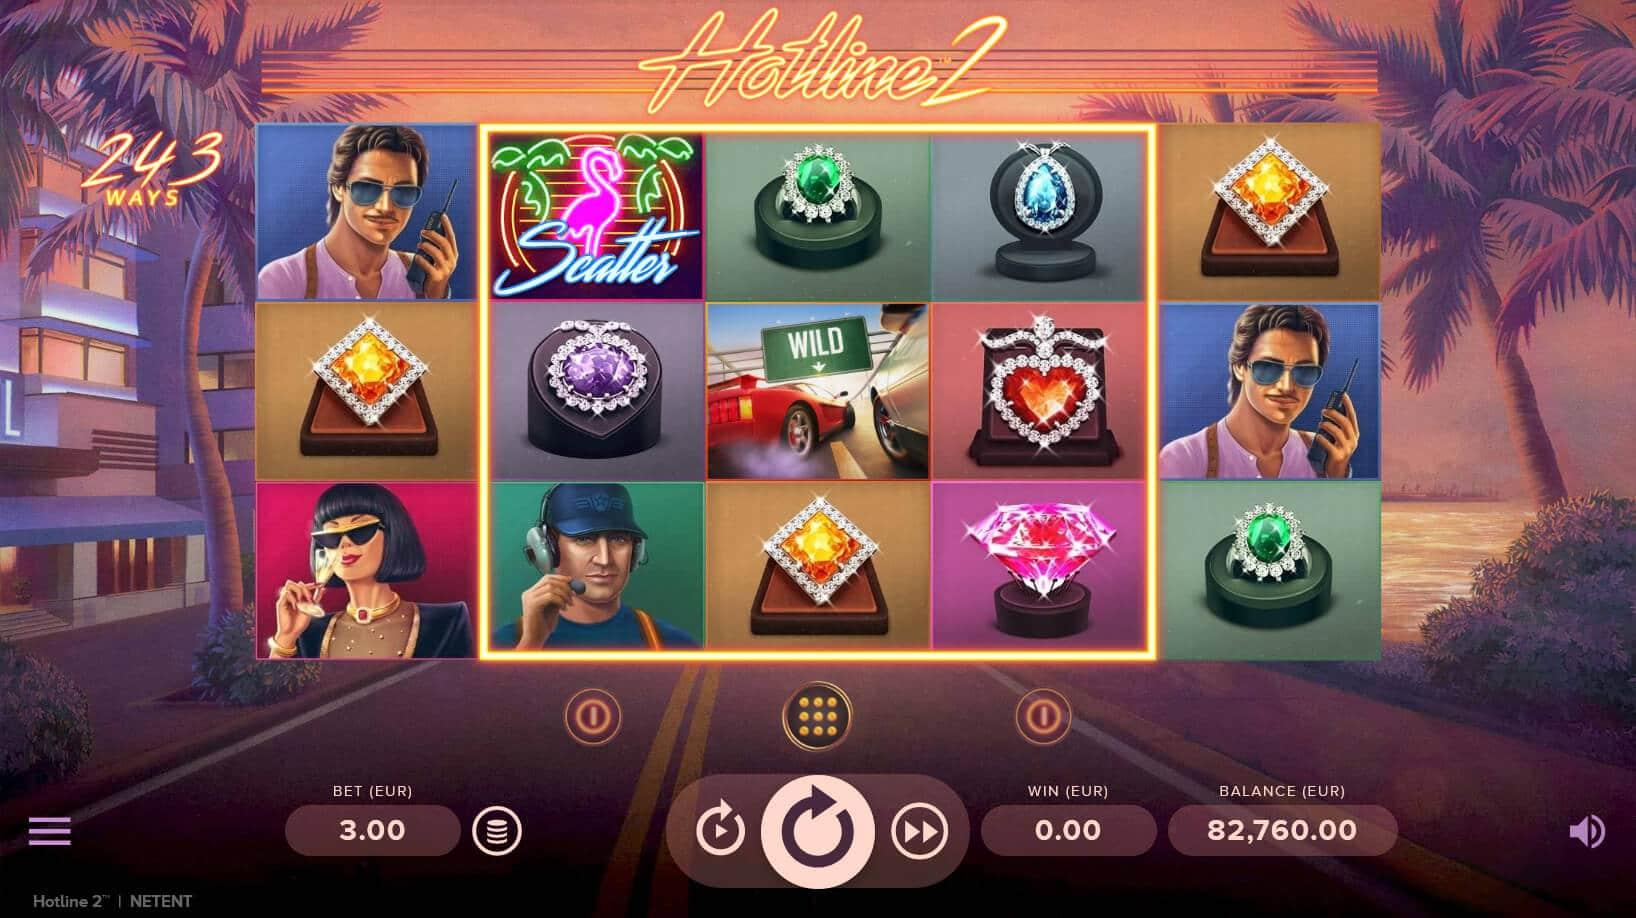 hotline 2 slot bonus game